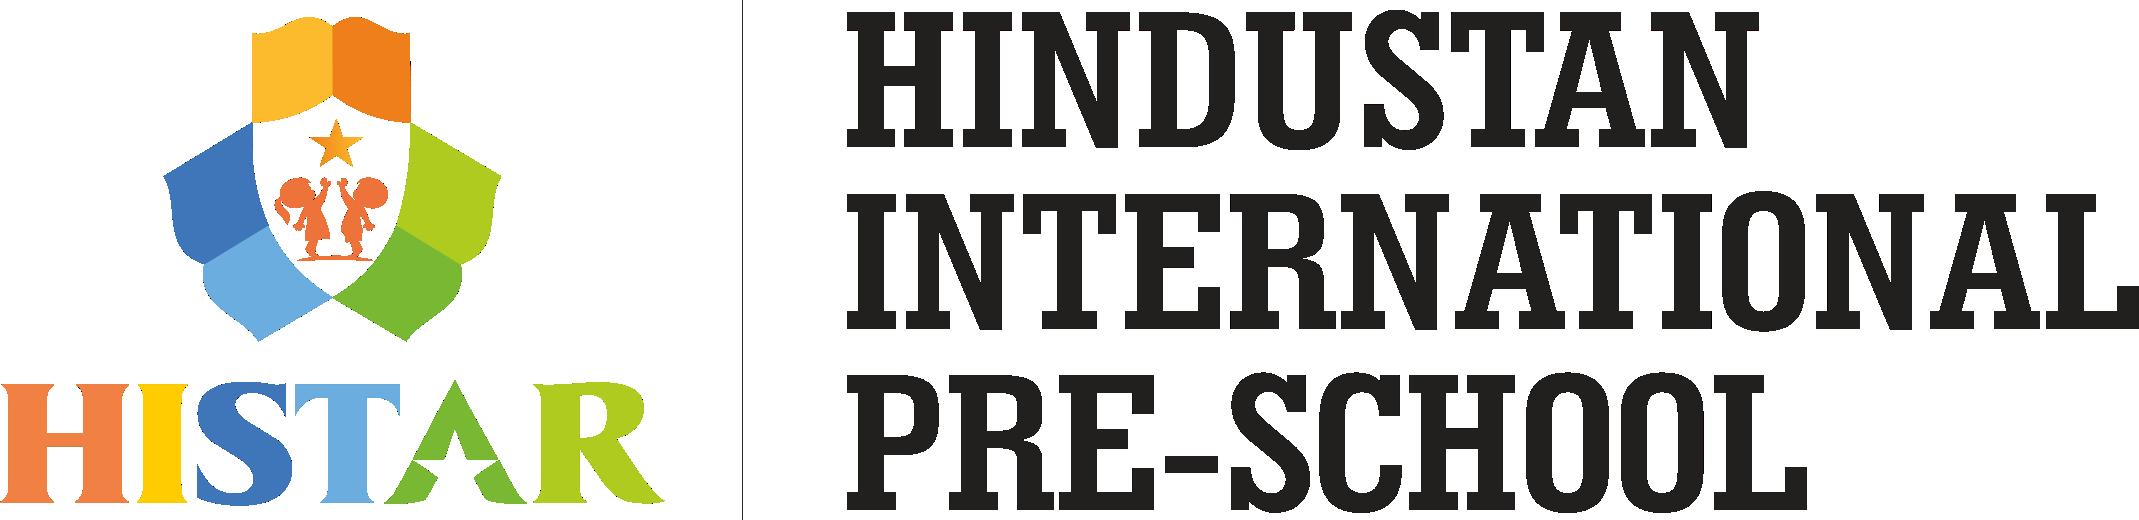 Hindustan International Pre School